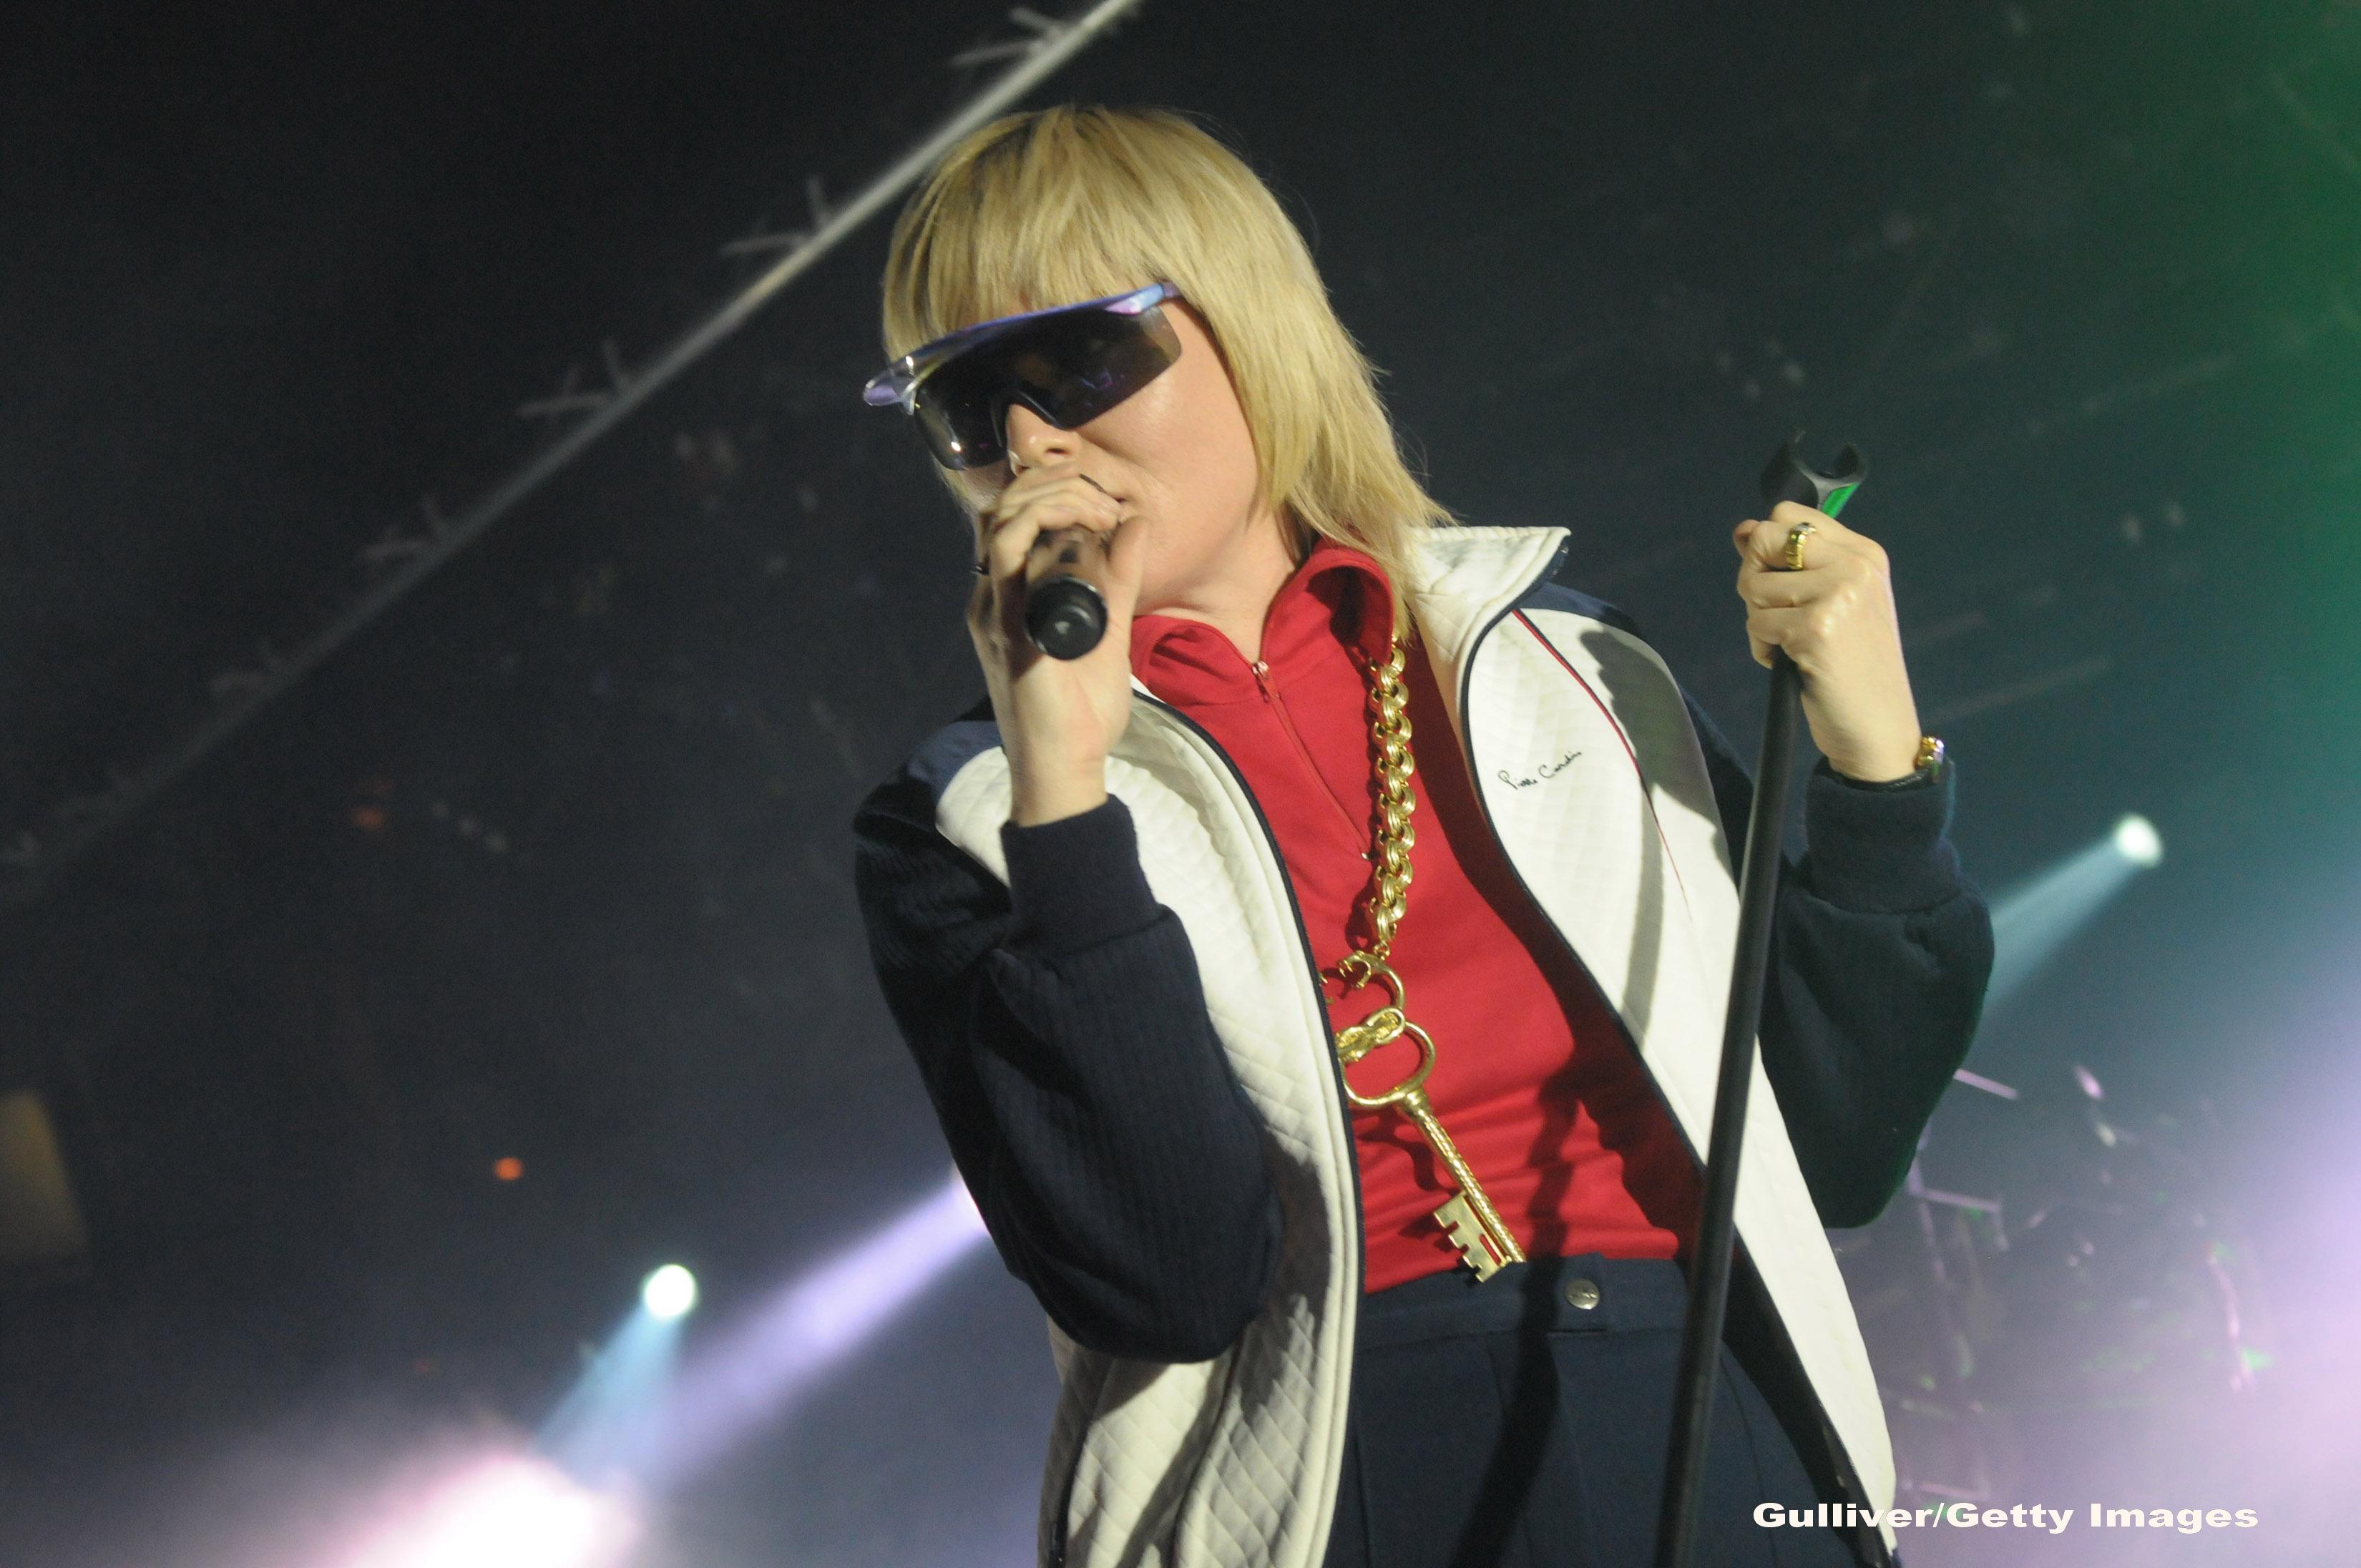 Concert Roisin Murphy la Bucuresti. Celebra artista irlandeza isi lanseaza noul album,